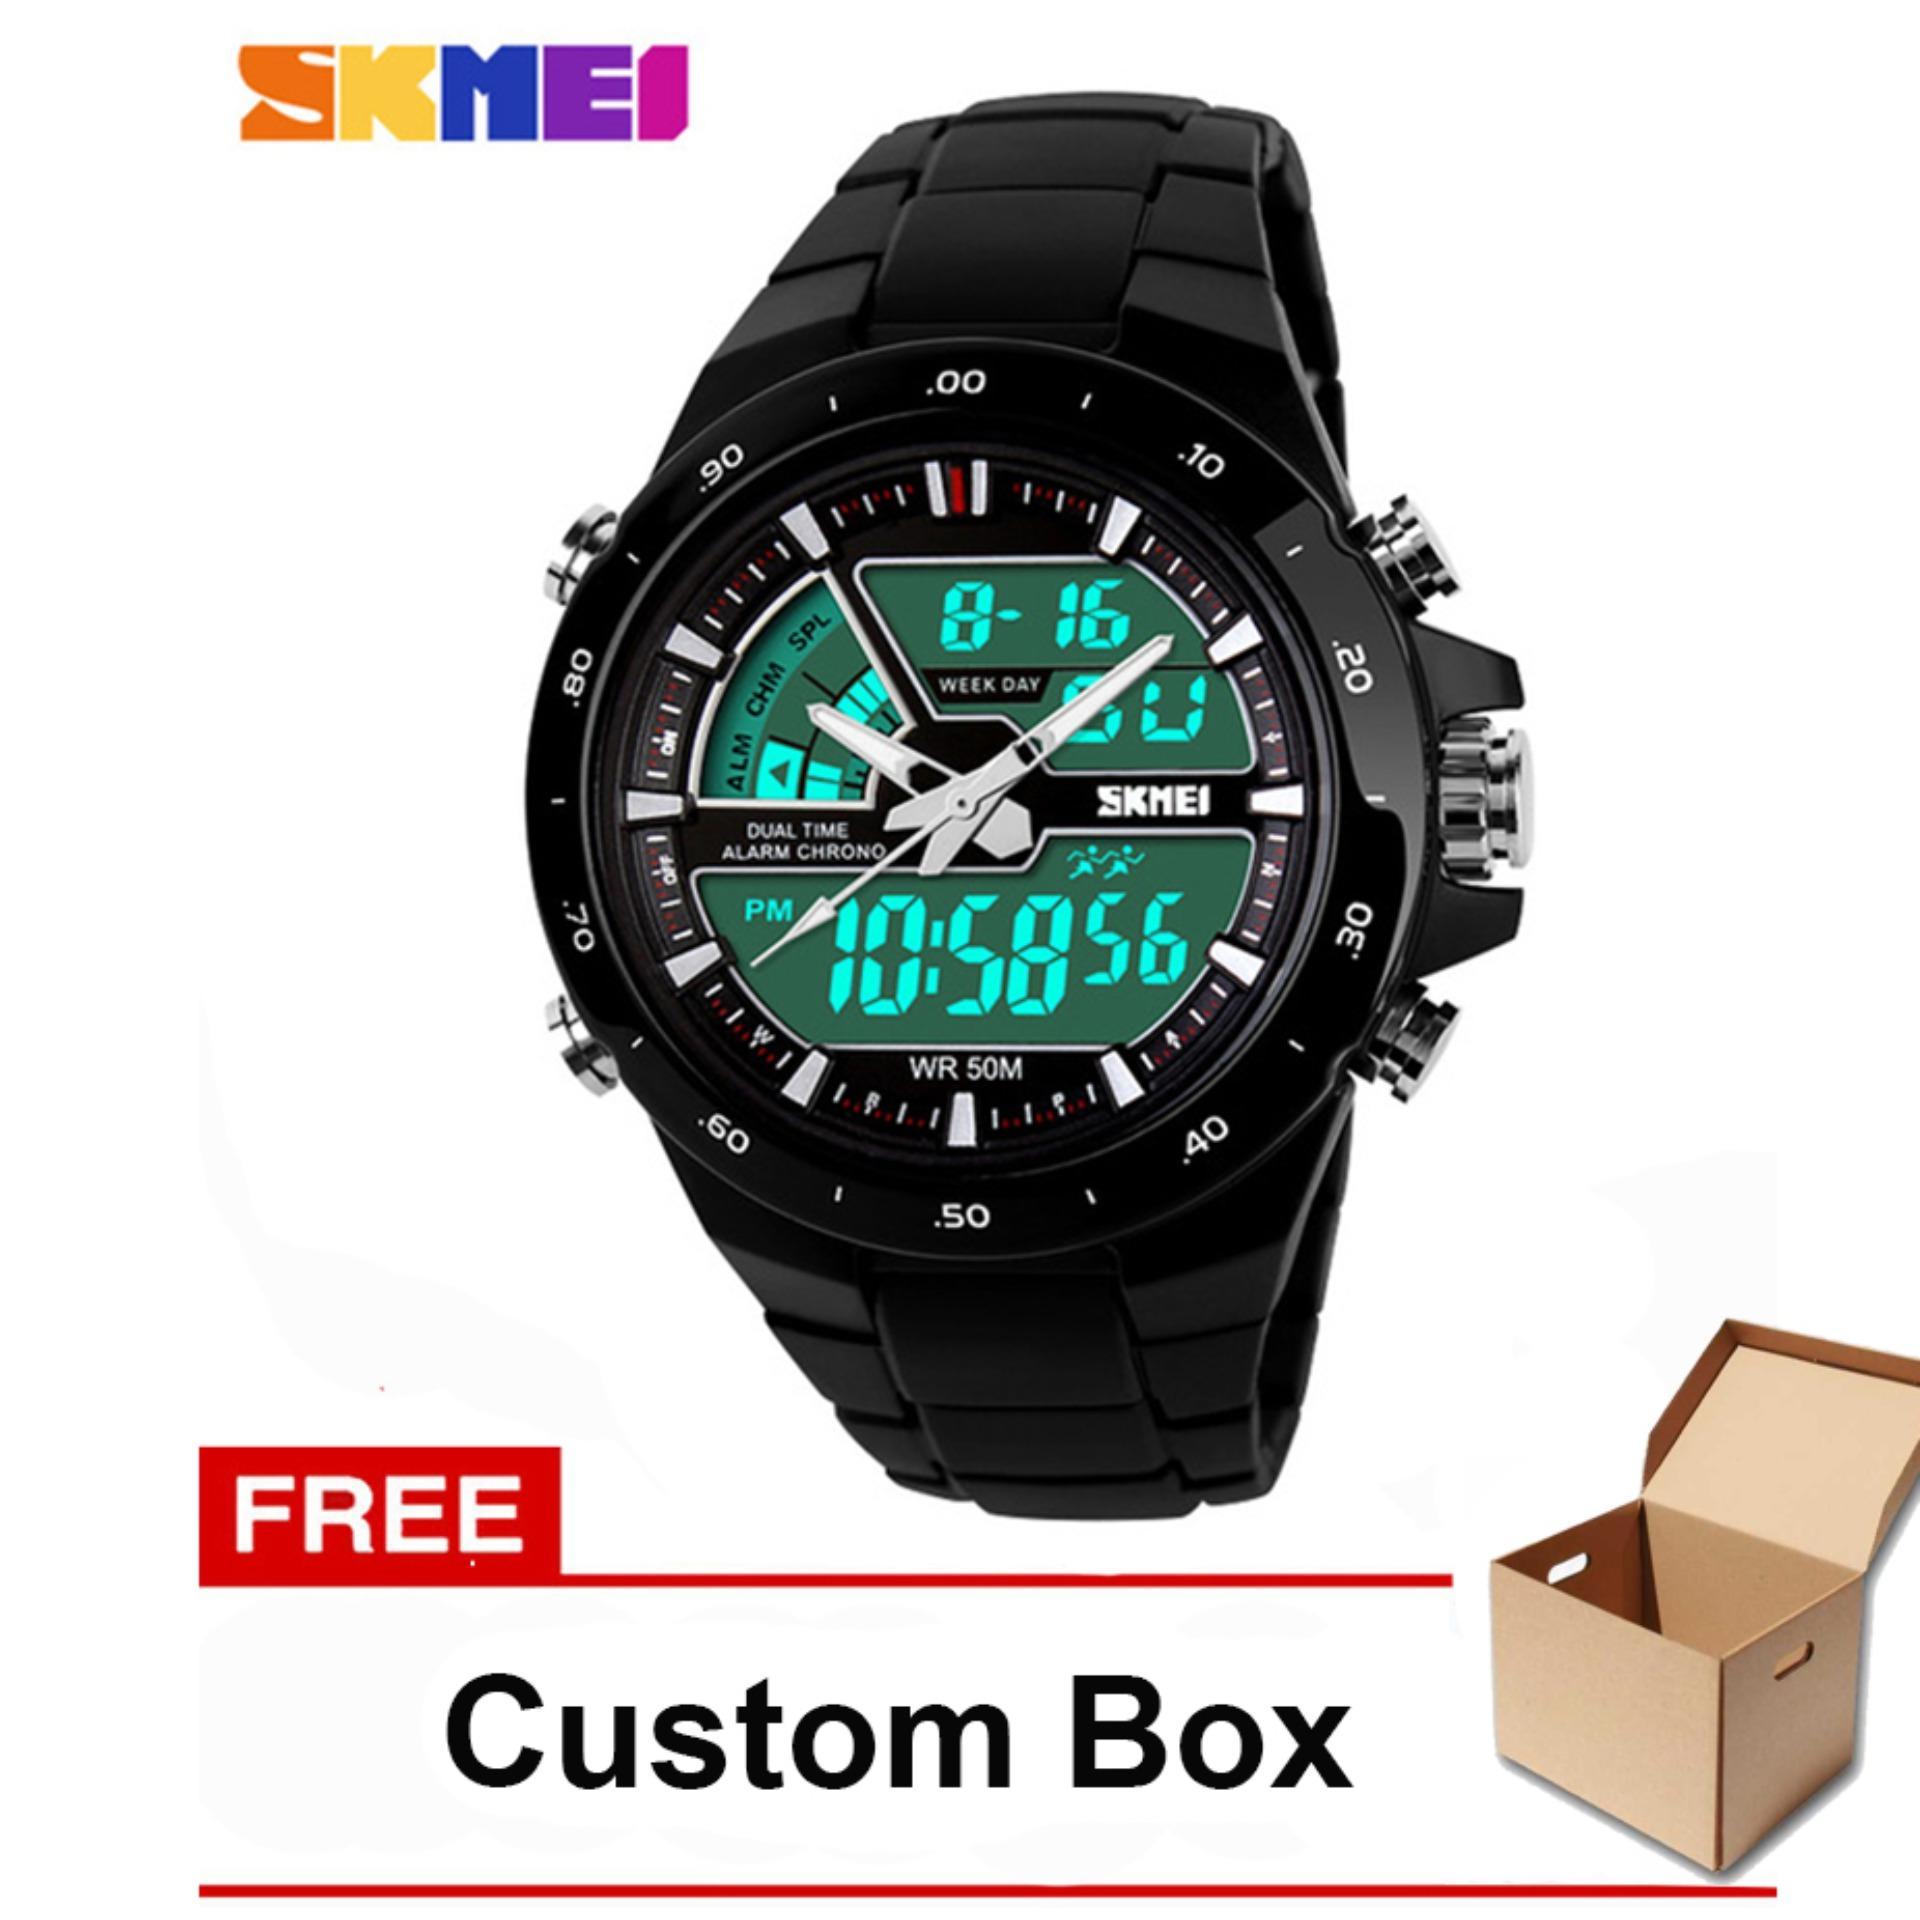 SKMEI Jam Tangan Pria Sport LED Dual-Time Waterproof Rubber Strap Wrist 1016 - Black